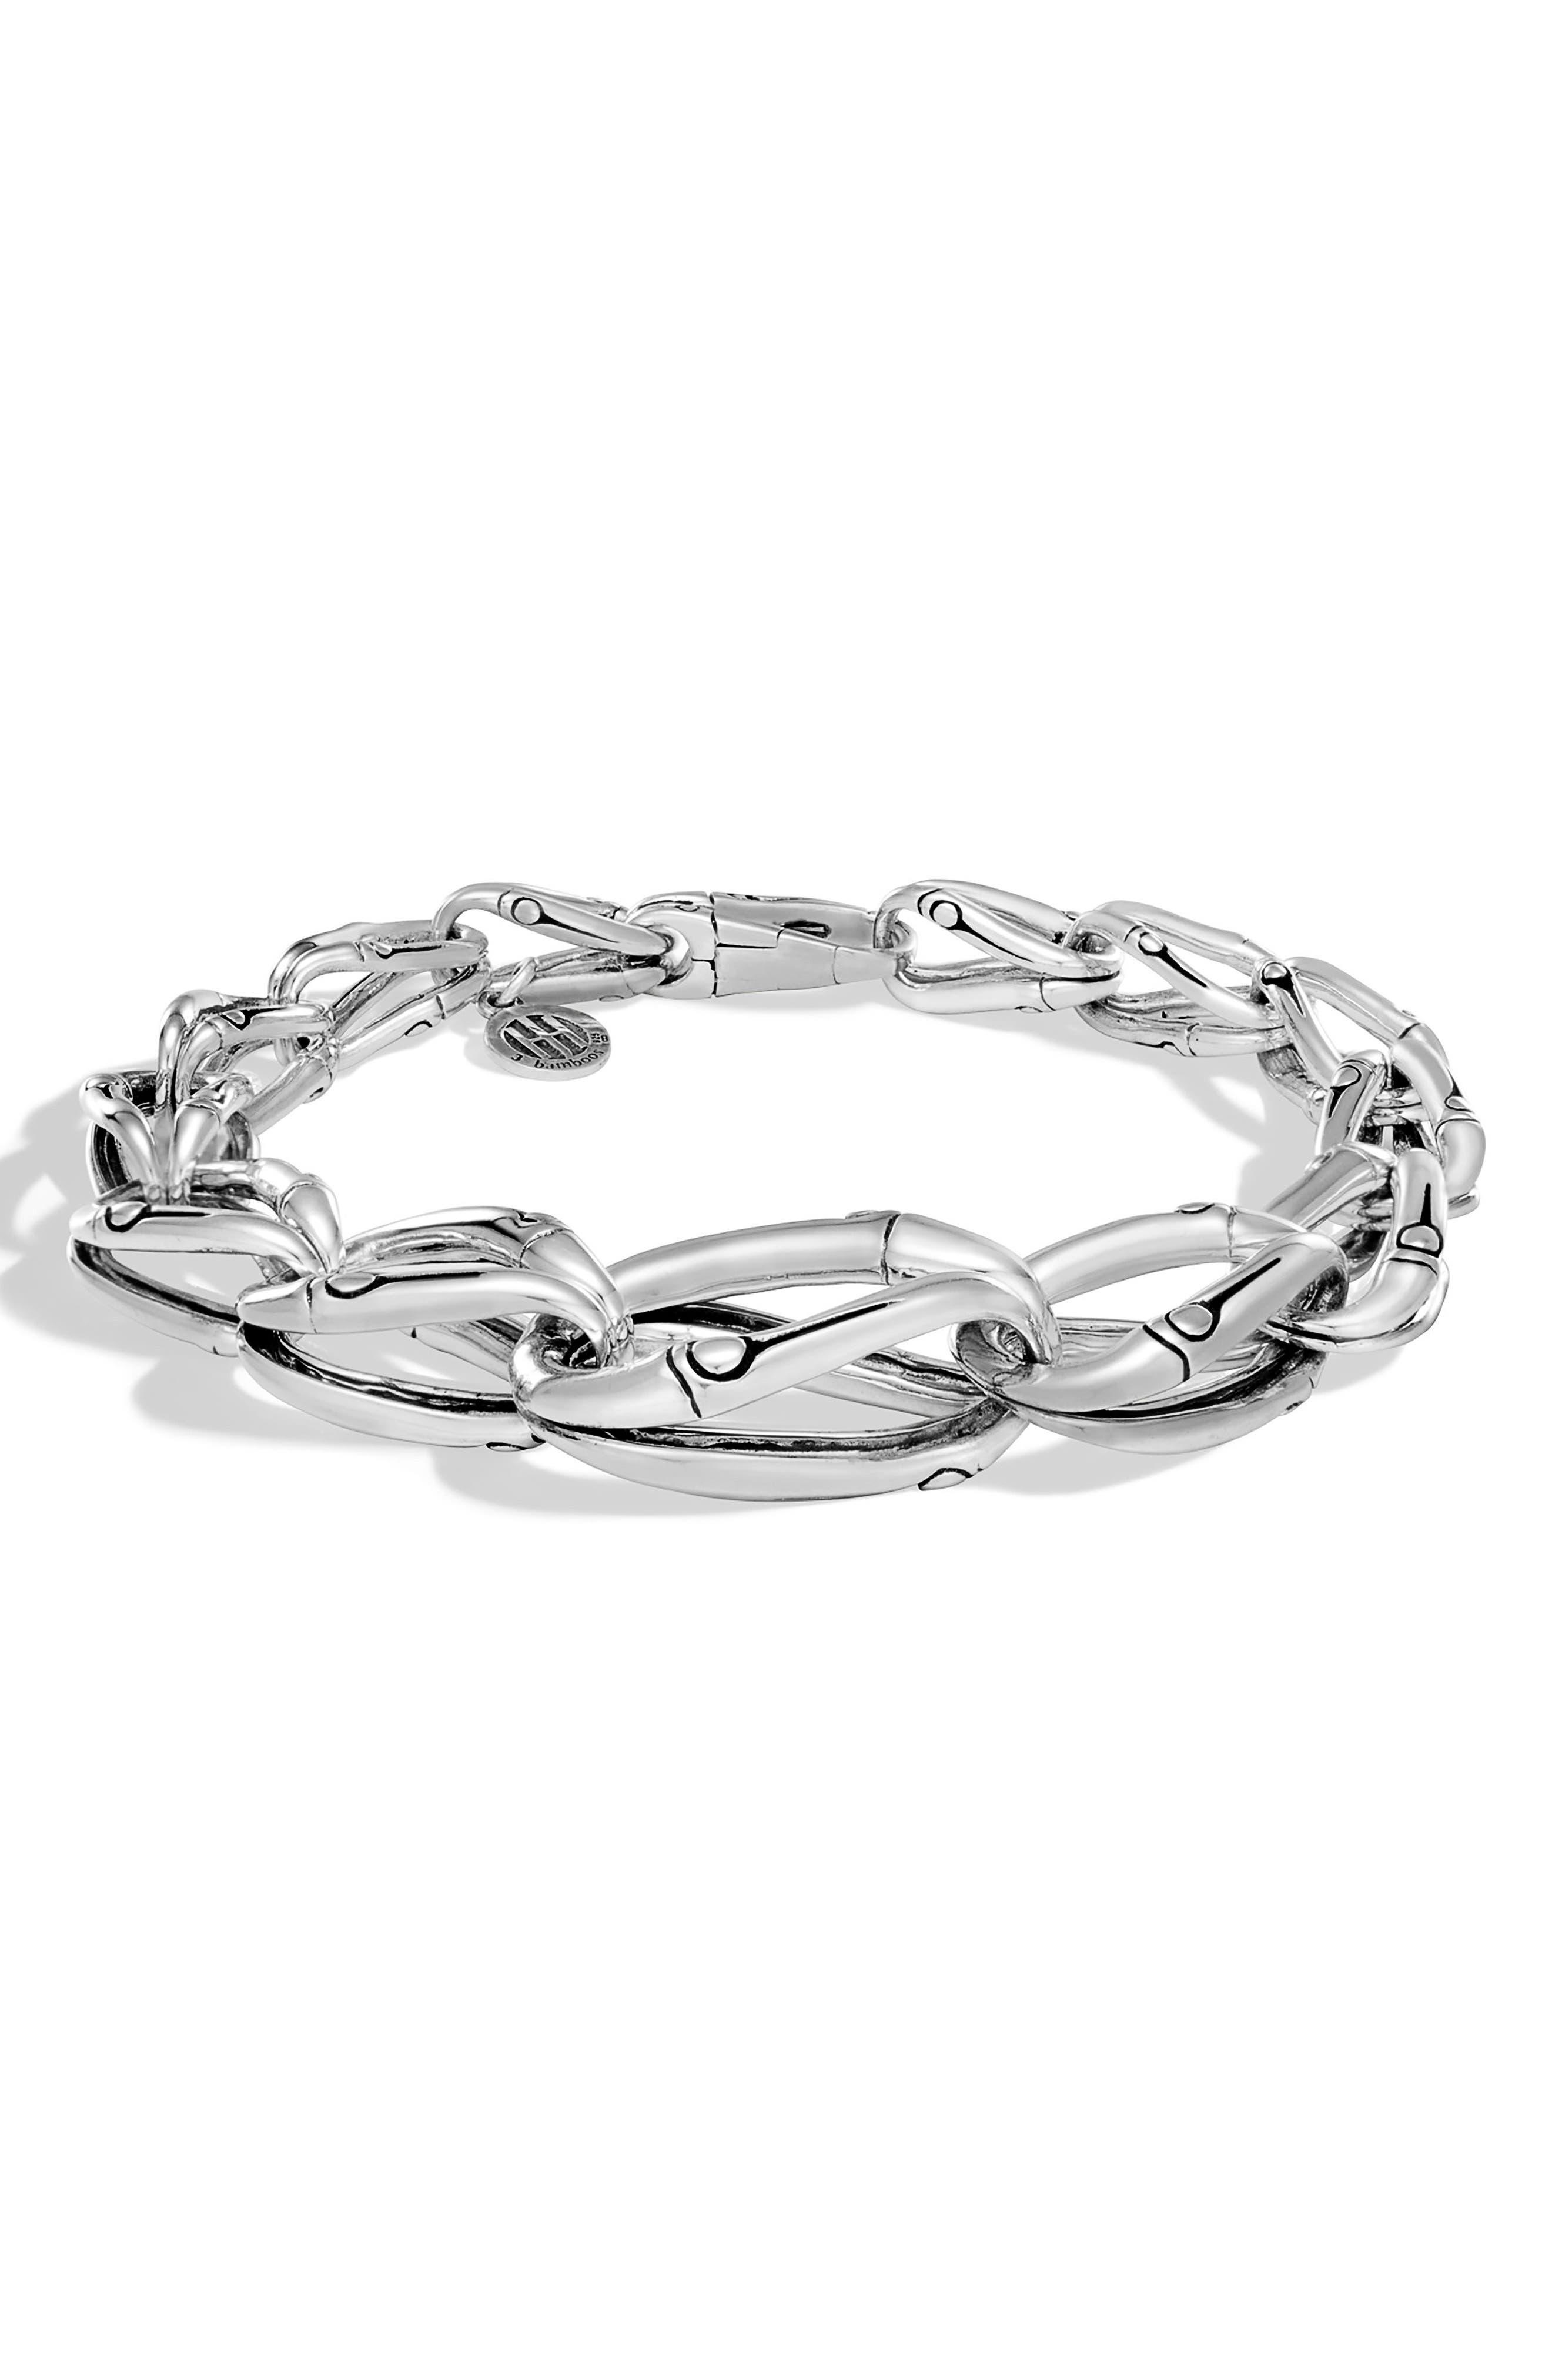 JOHN HARDY Bamboo Tapered Link Bracelet